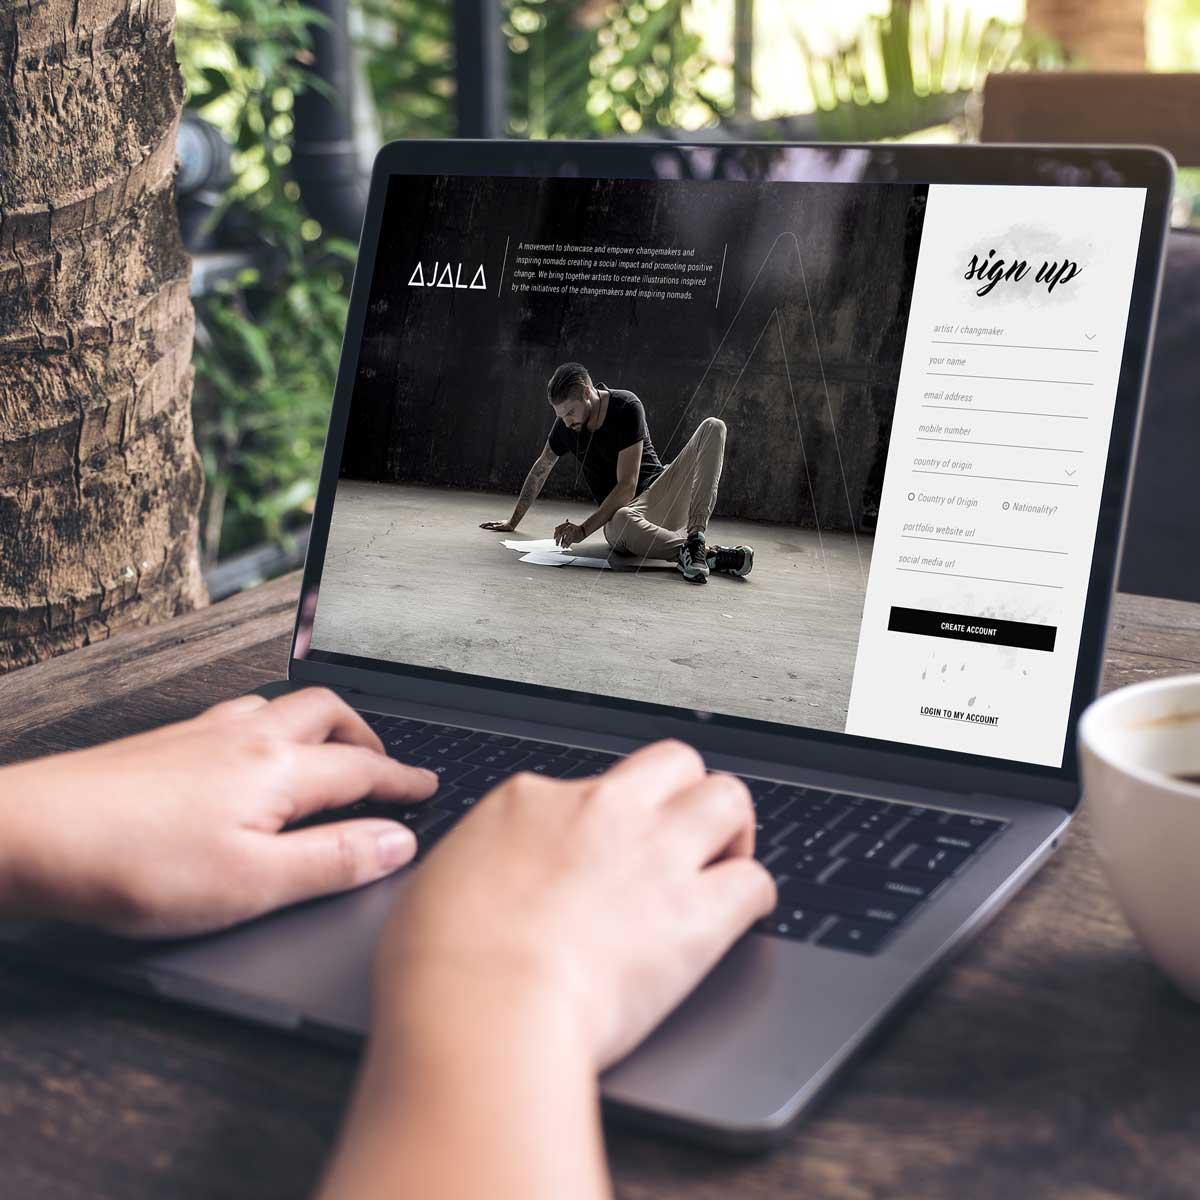 The Ajala Project - User Interface Design